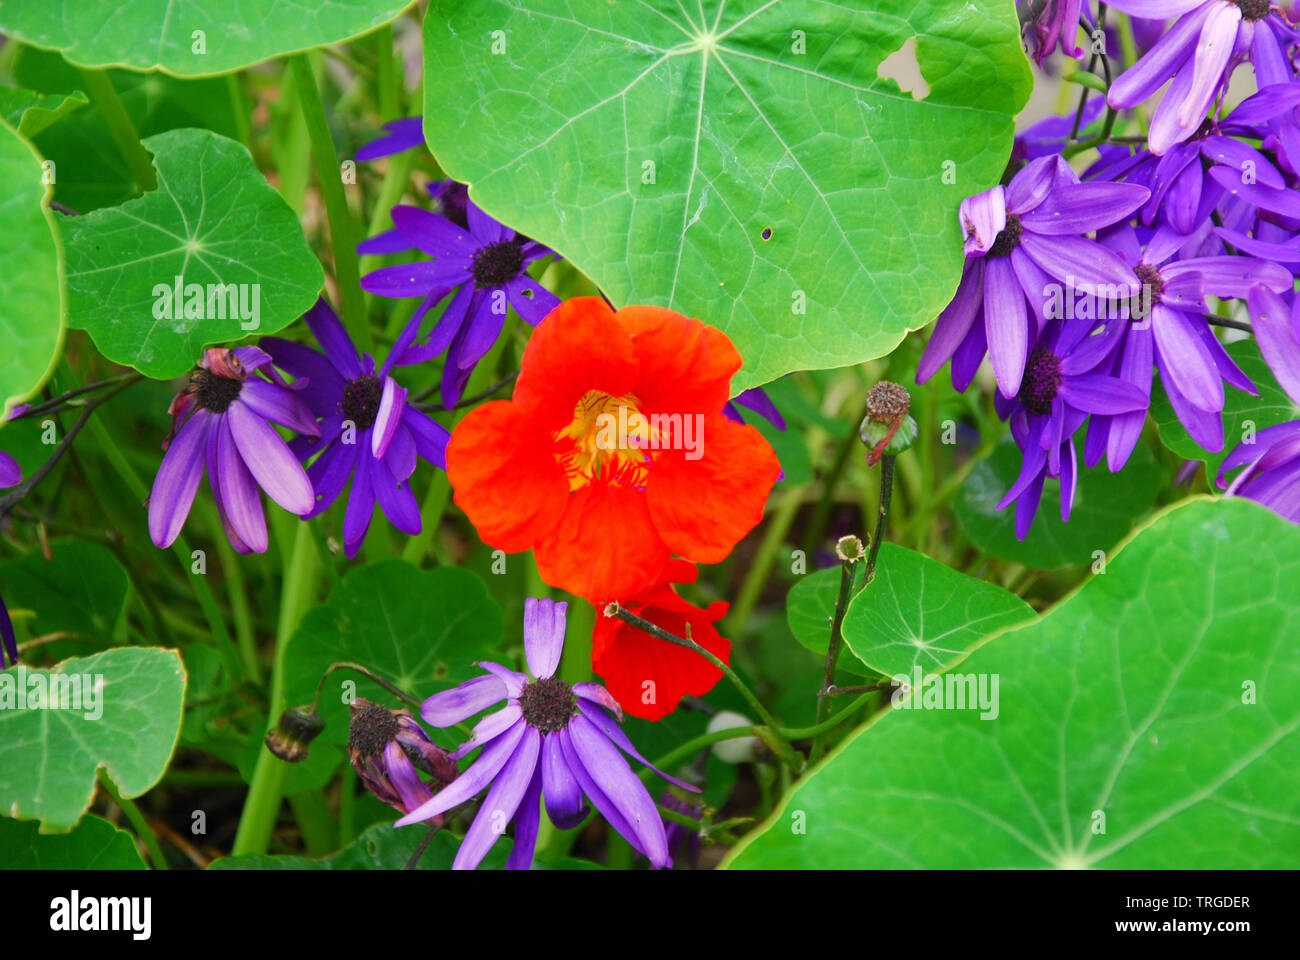 Portland. 5th June 2019. Nasturtium and Senetti bloom in a sunny Portland garden. credit: stuart fretwell/Alamy Live News - Stock Image